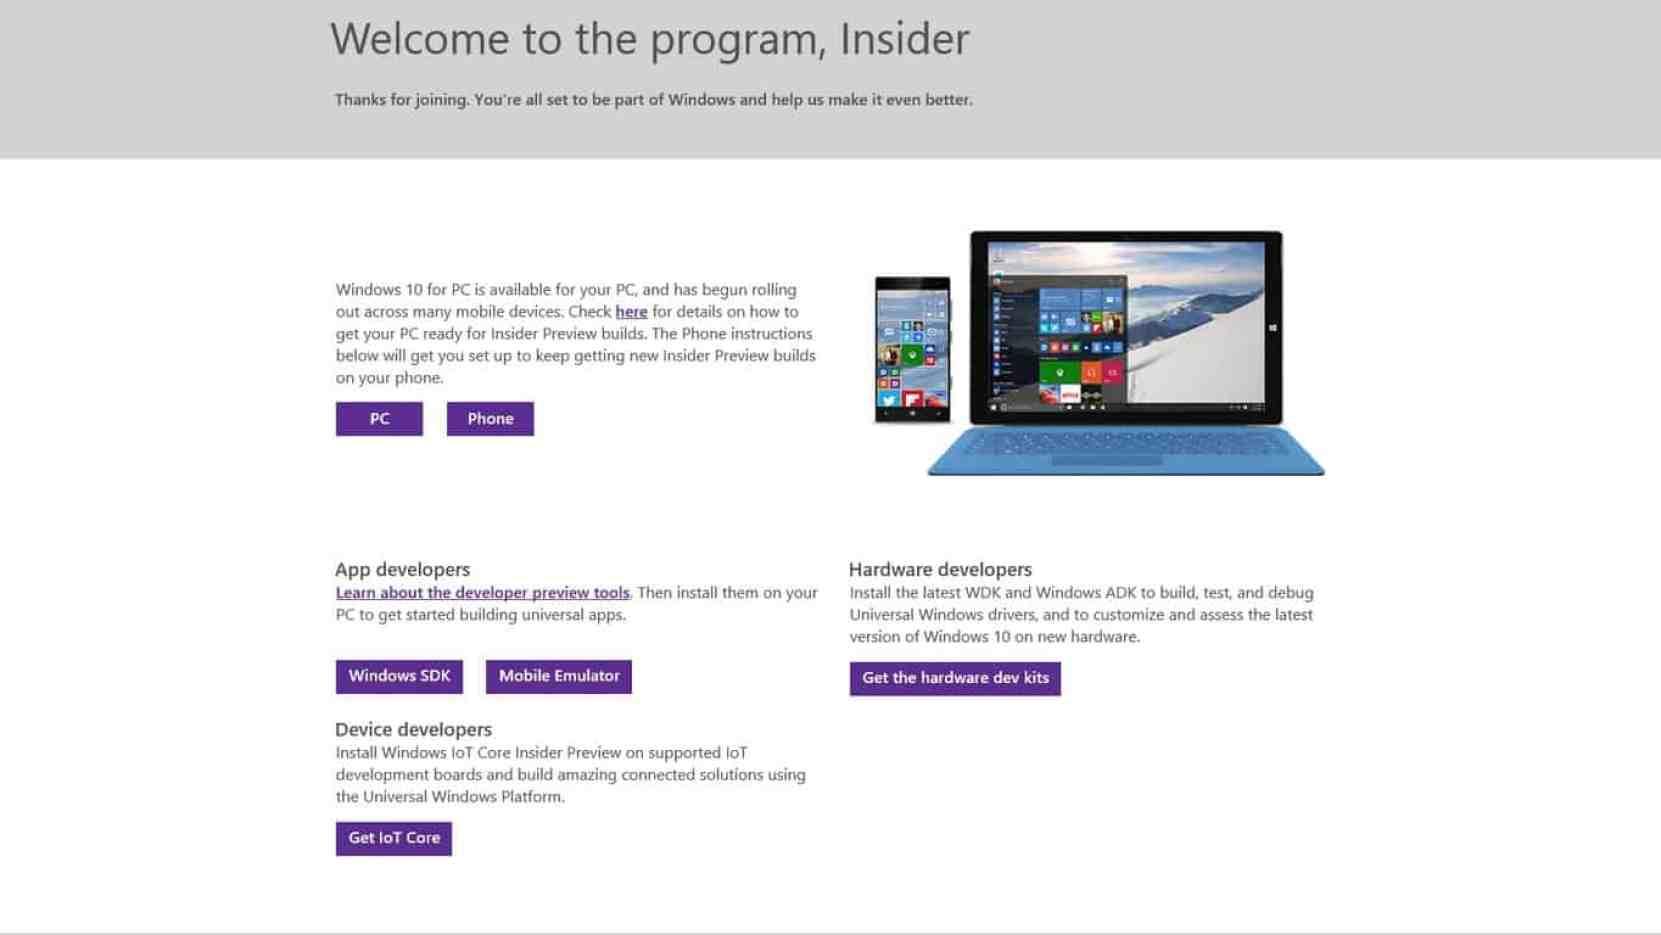 Several Windows Insider Previews